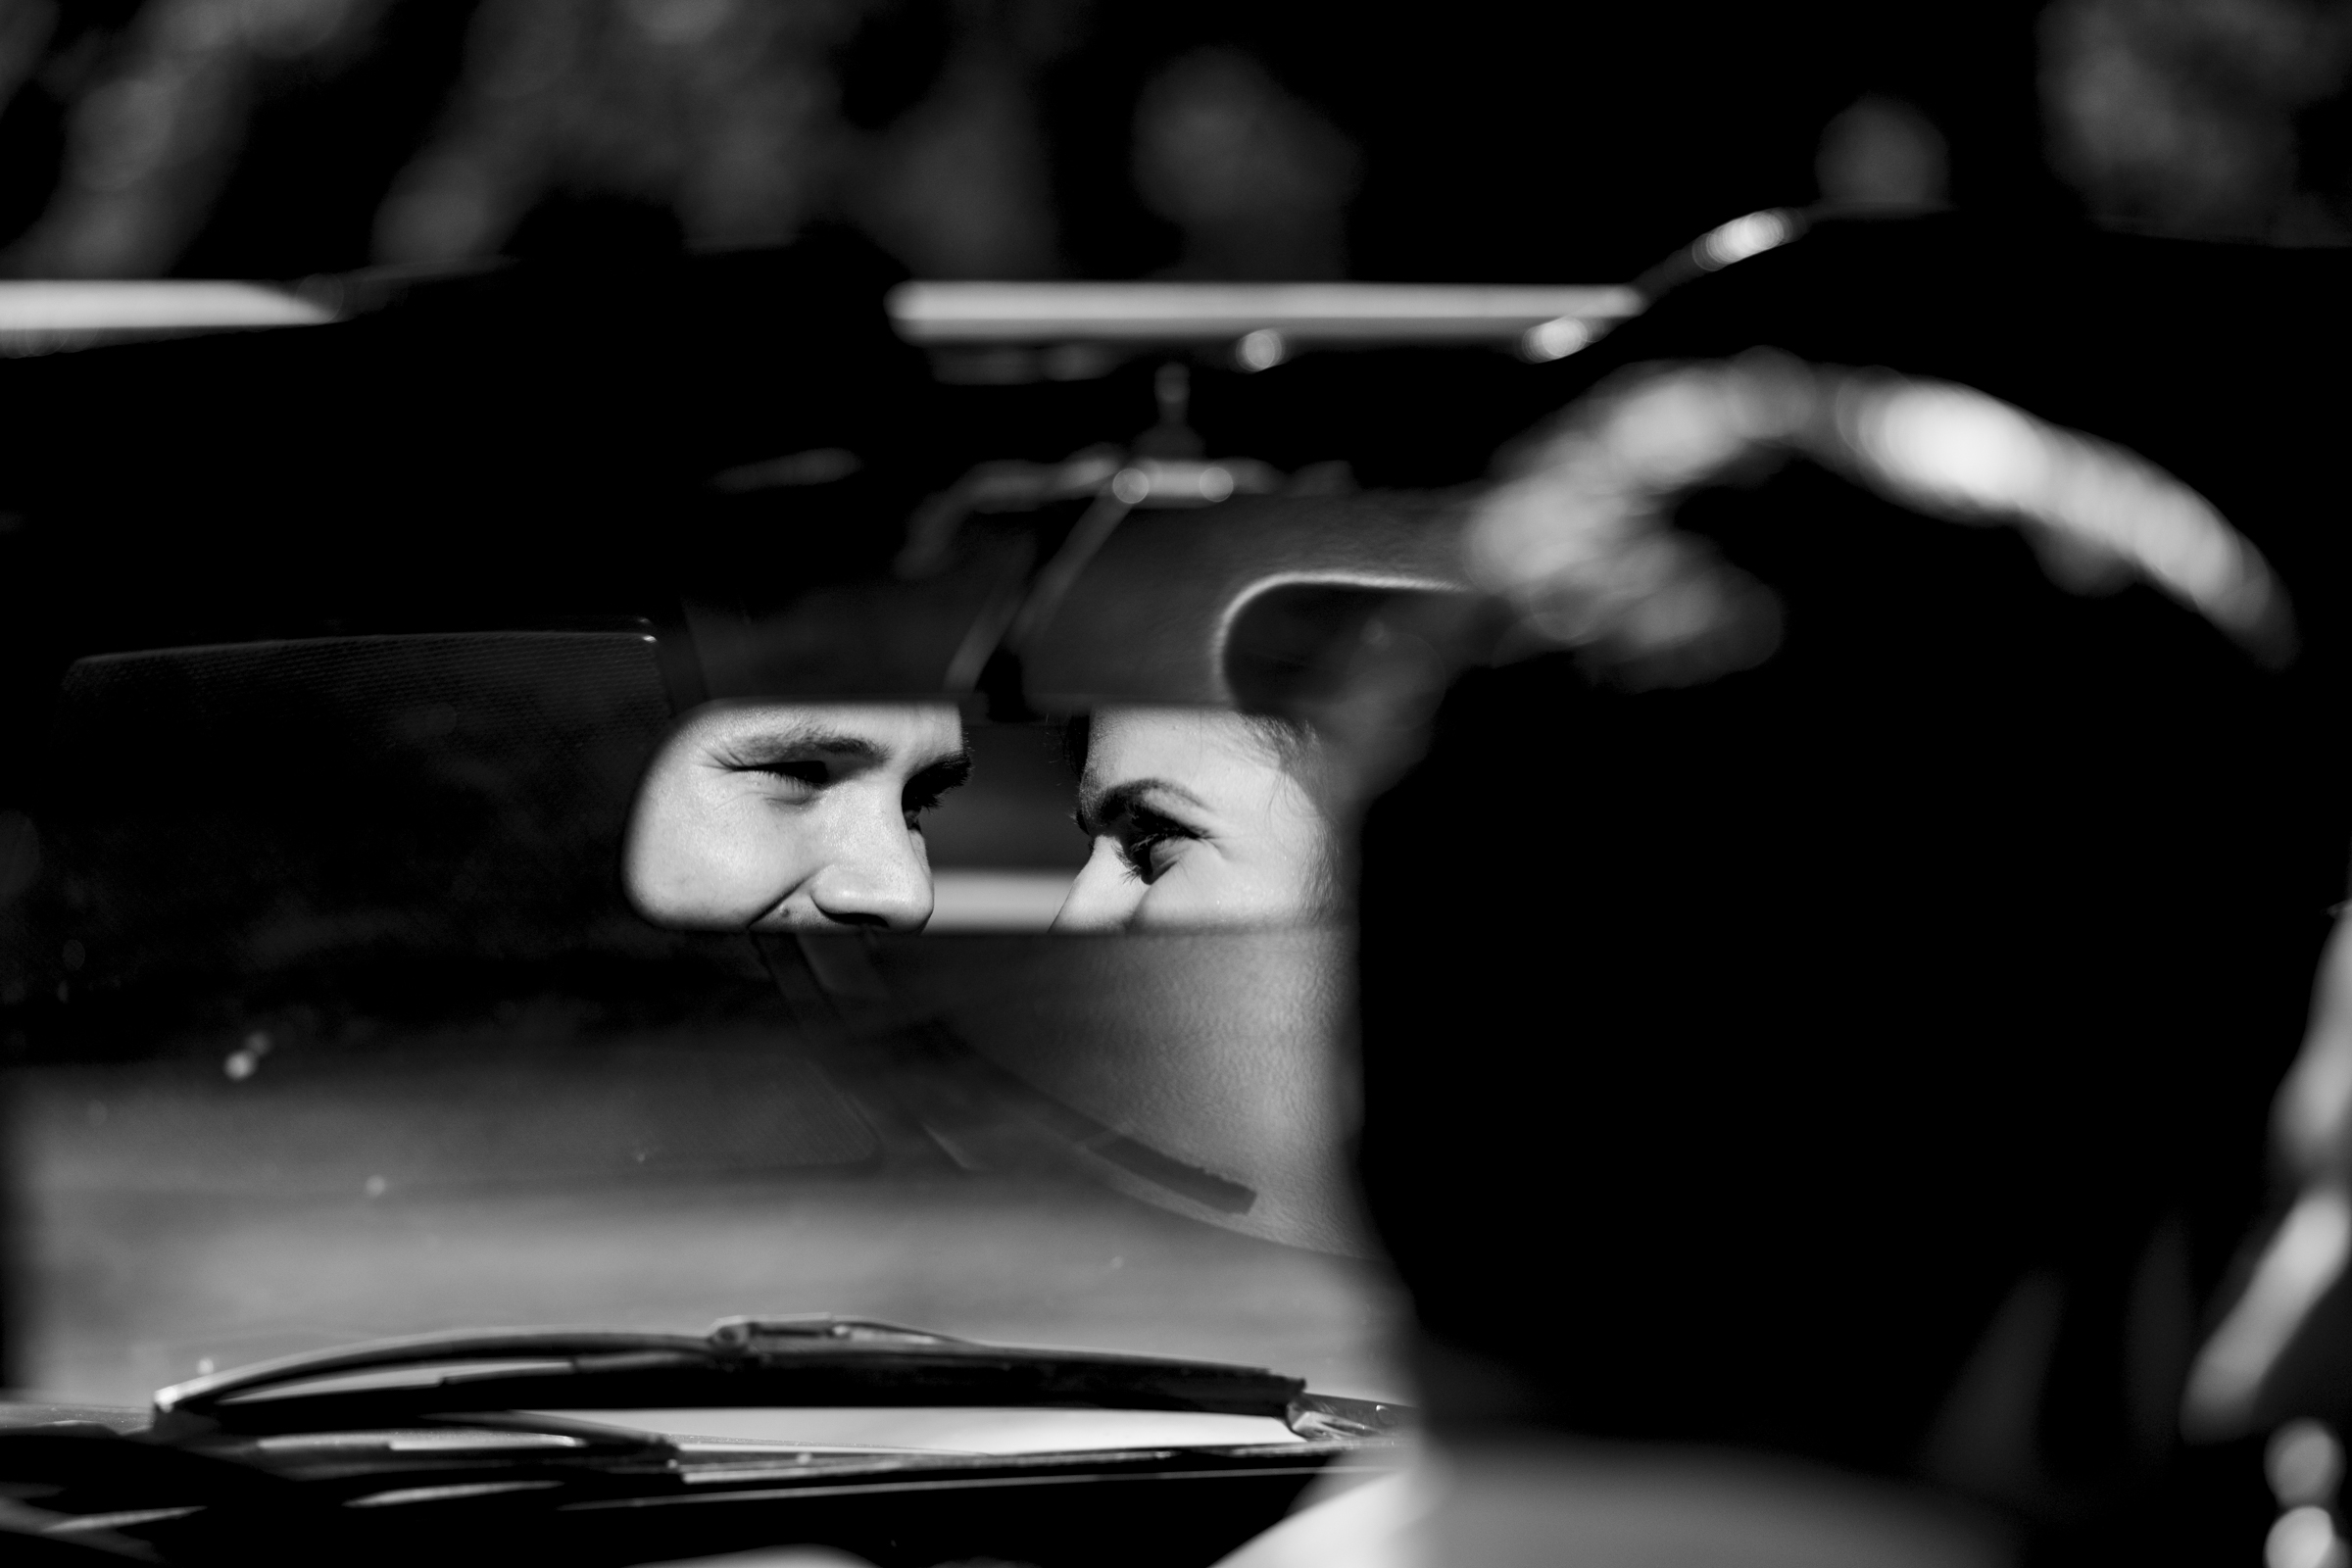 Black and white wedding photography ideas